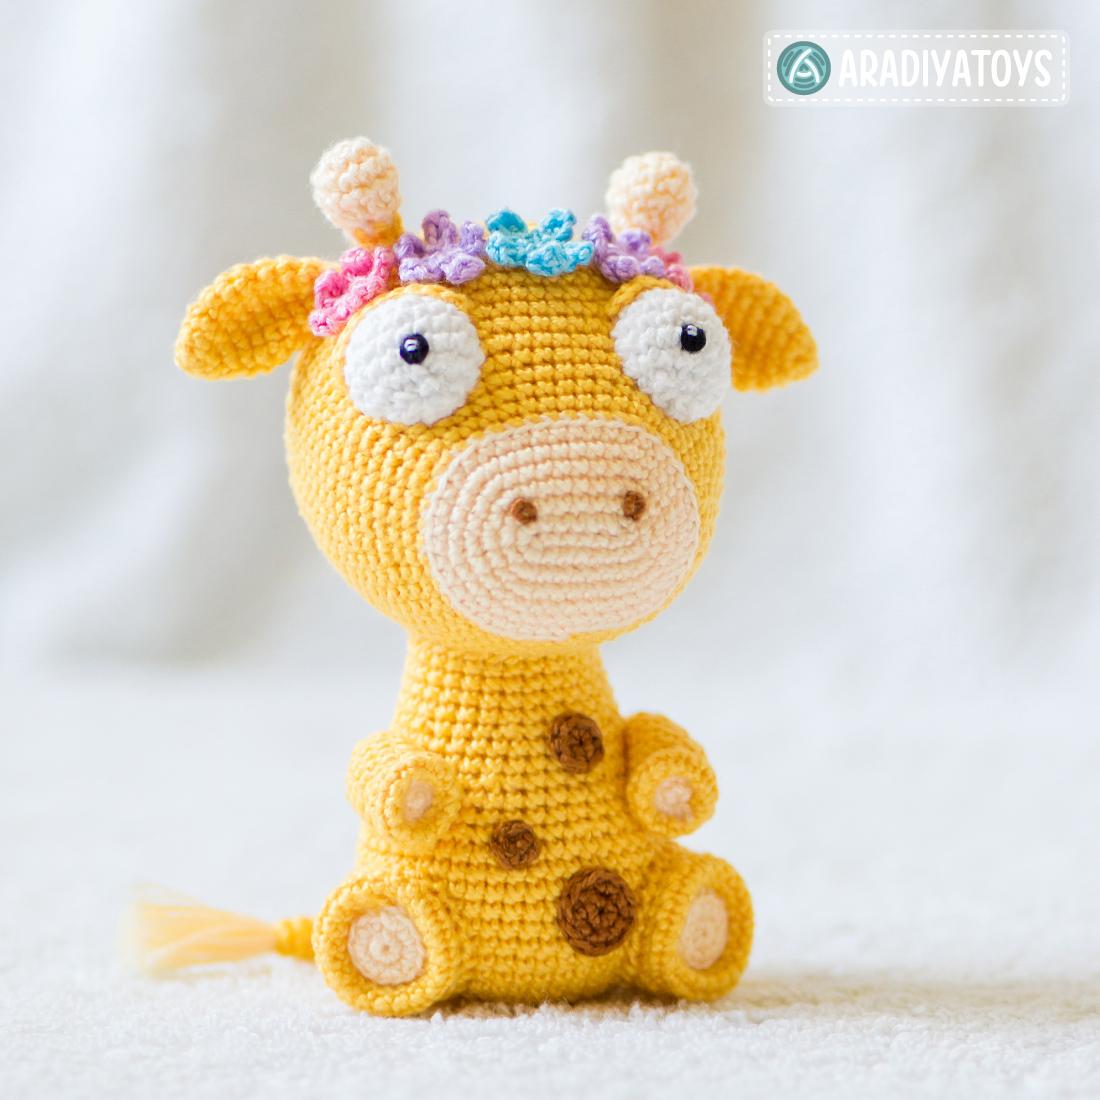 Crochet Pattern of Giraffe Ellie by AradiyaToys